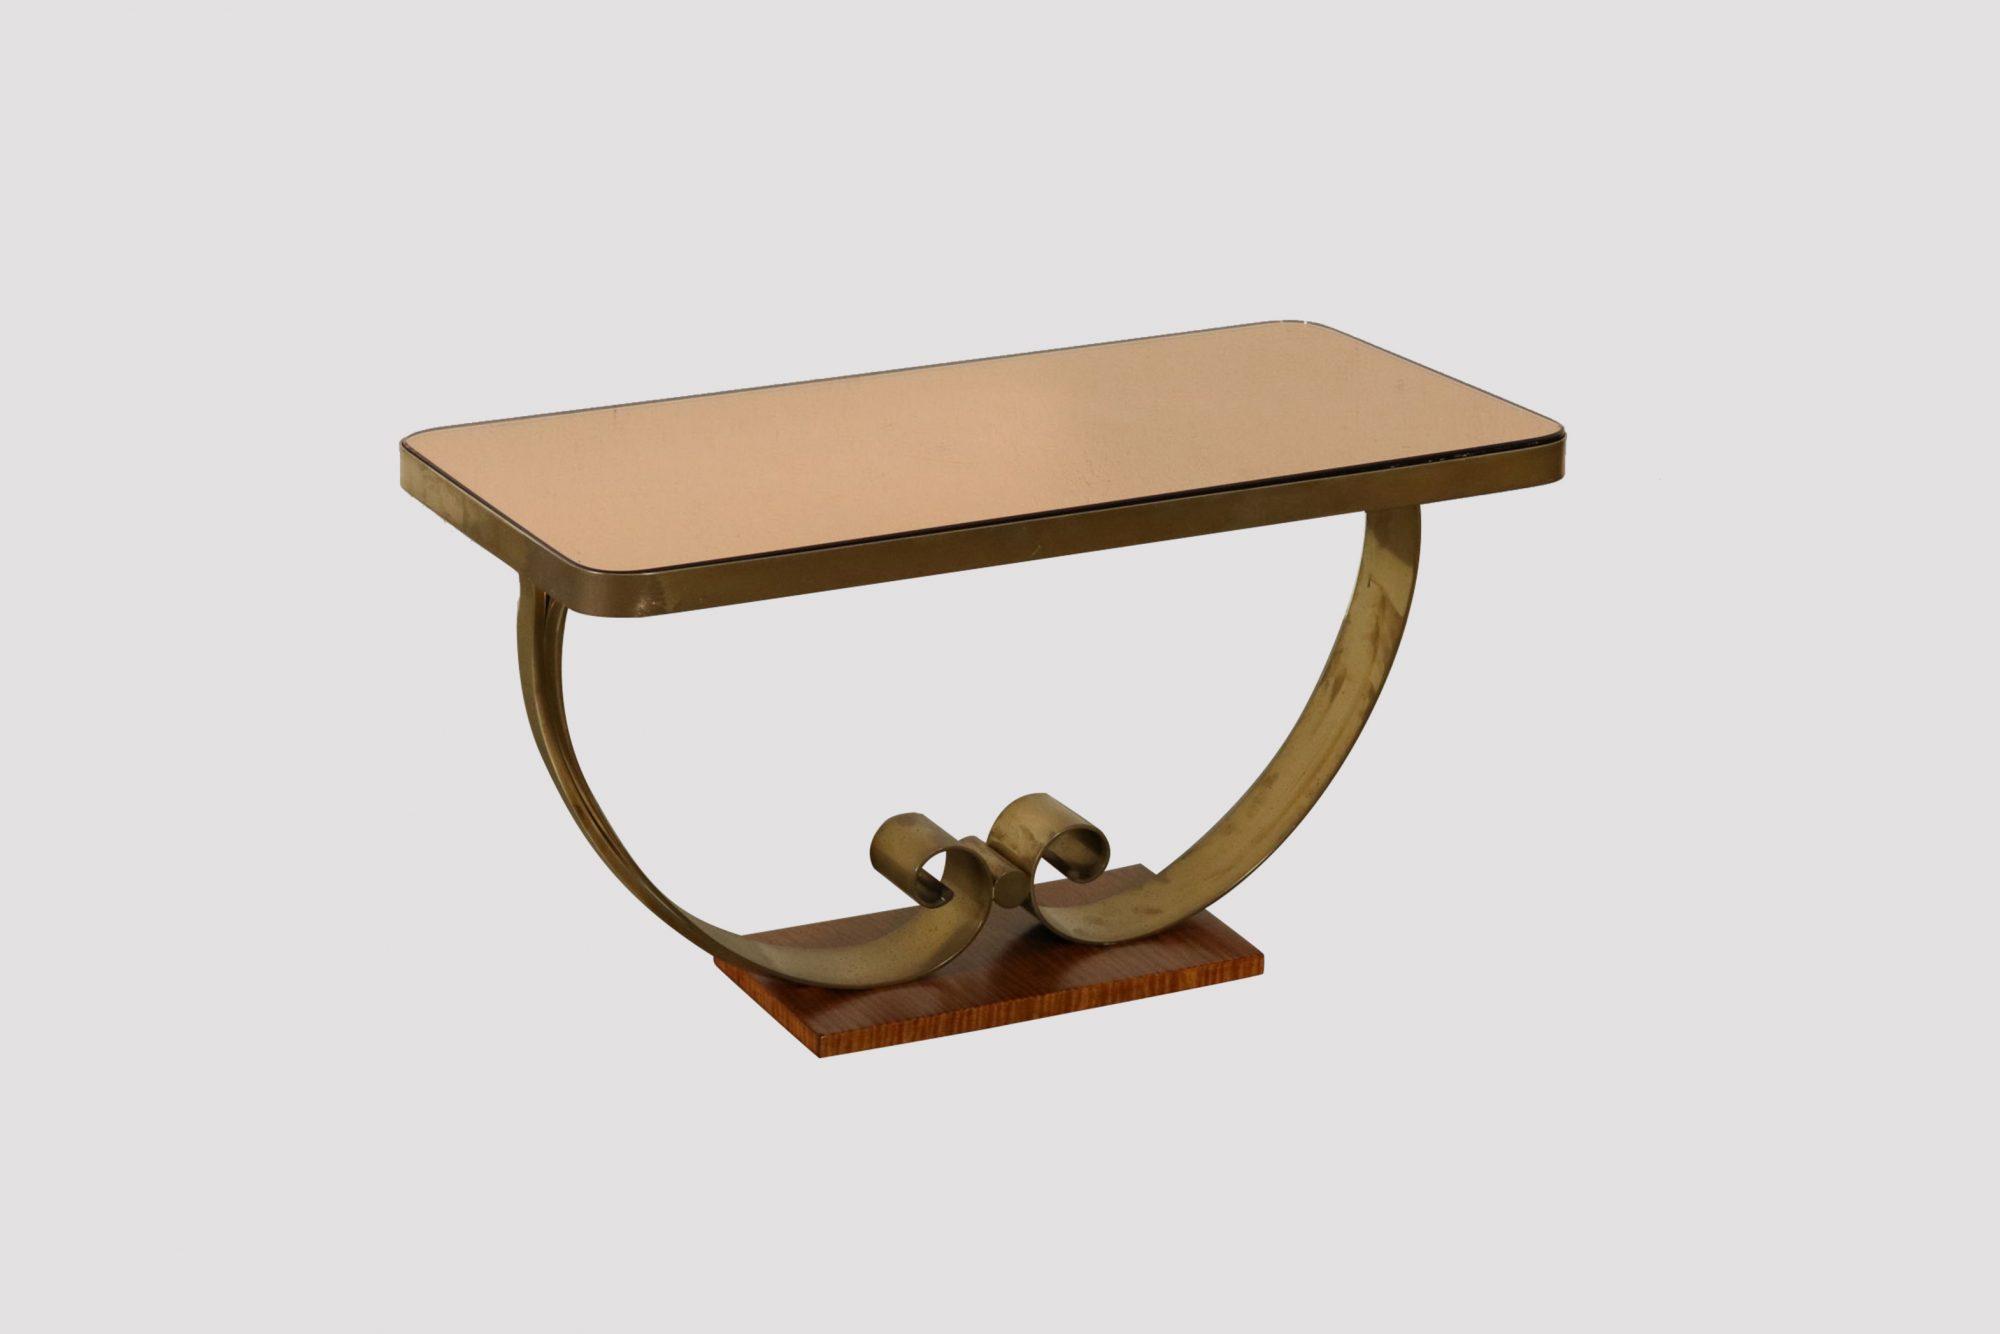 Tavolino Anni 30-40